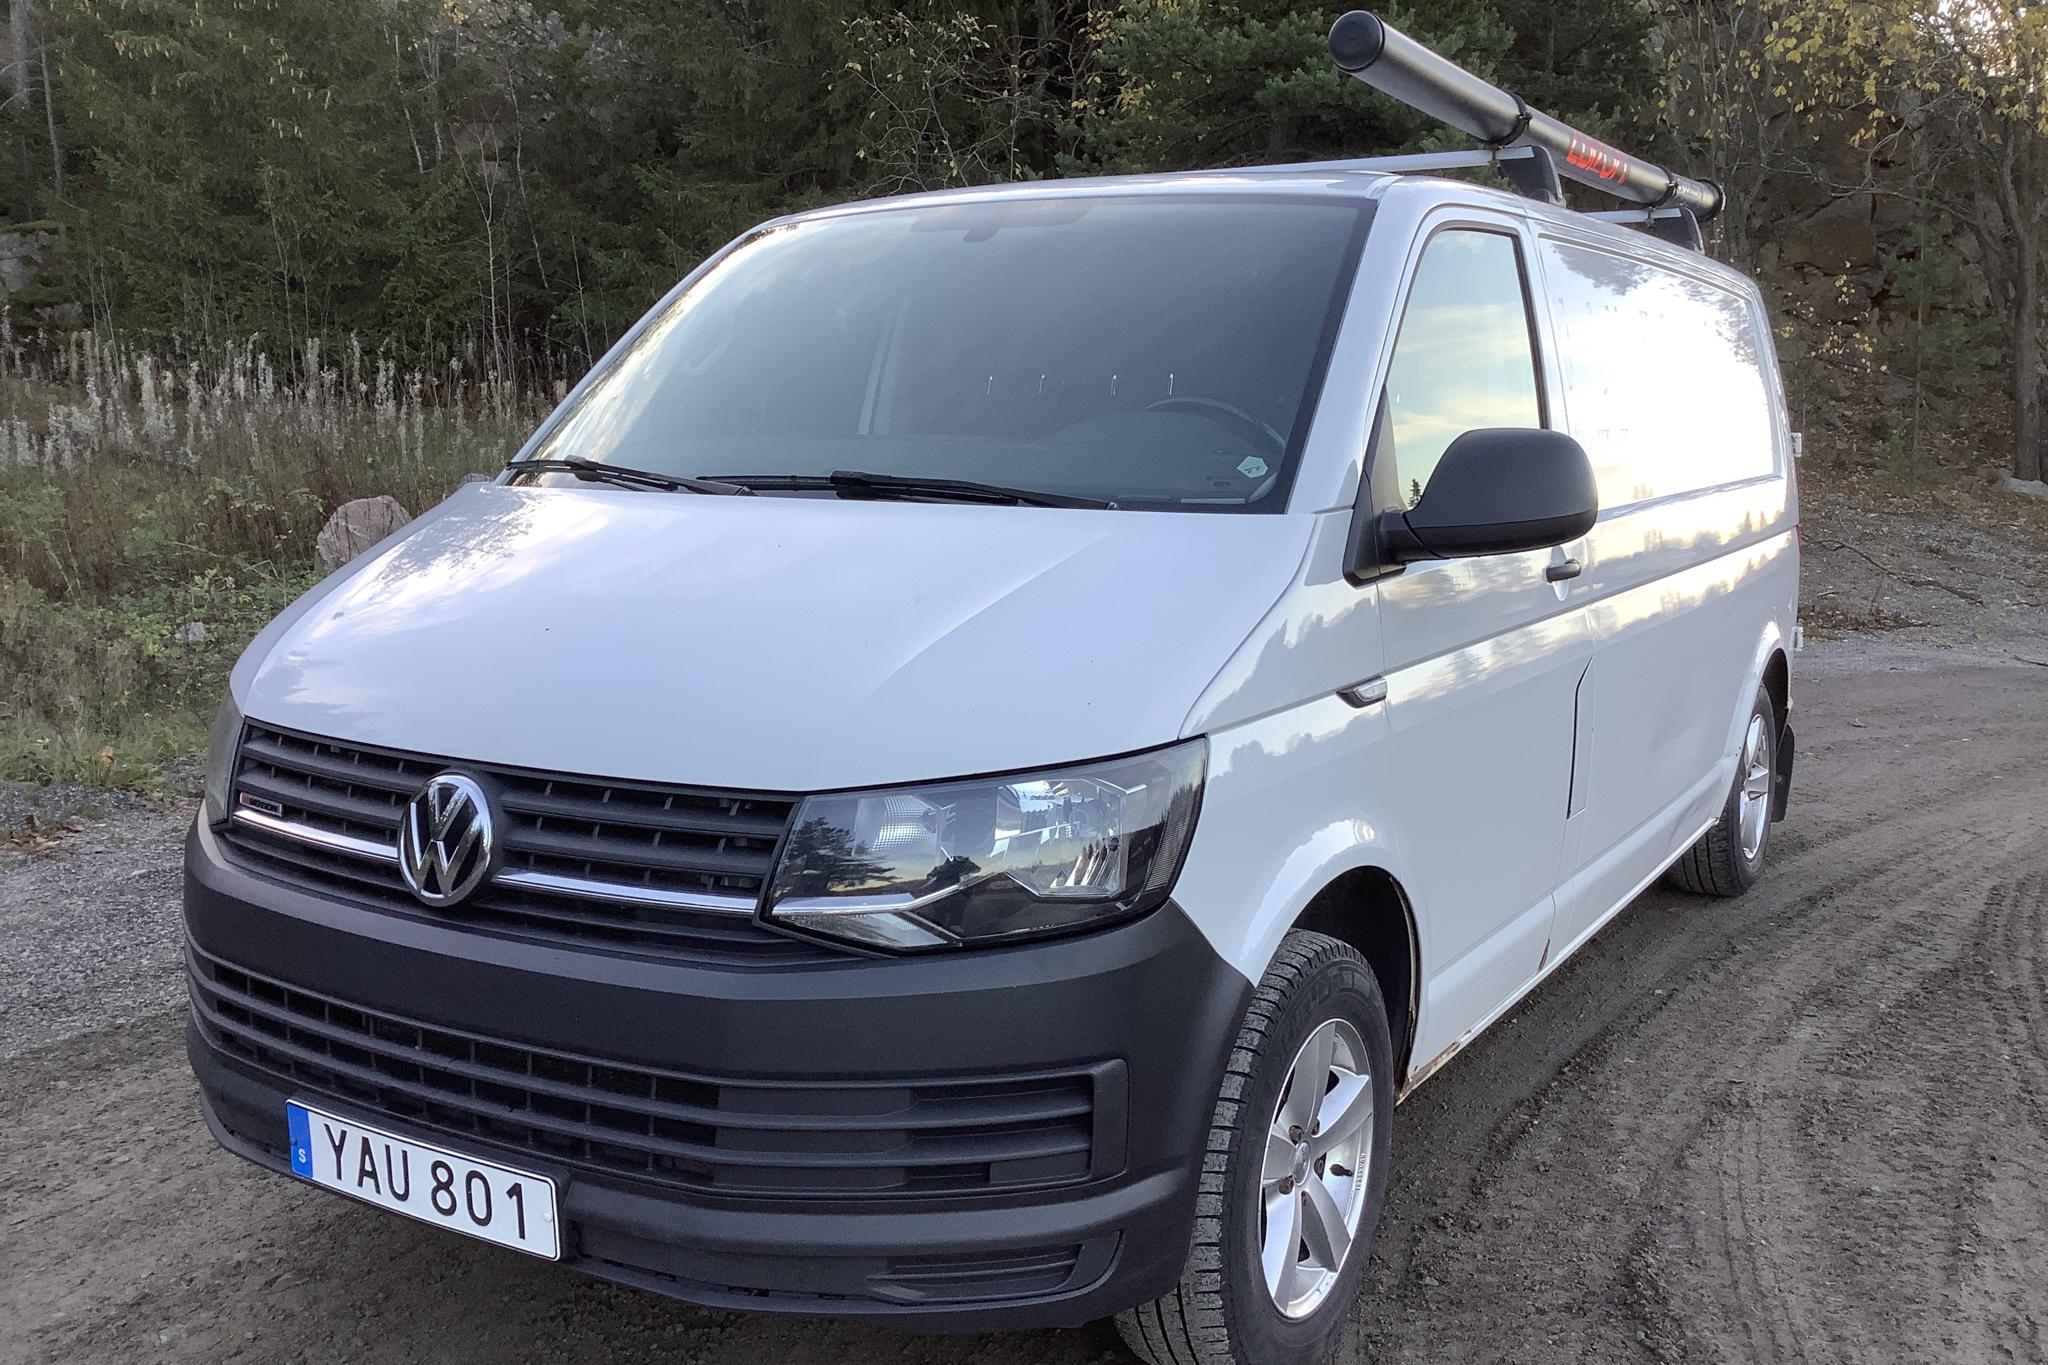 VW Transporter T6 2.0 TDI BMT Skåp 4MOTION (140hk) - 13 278 mil - Manuell - vit - 2016